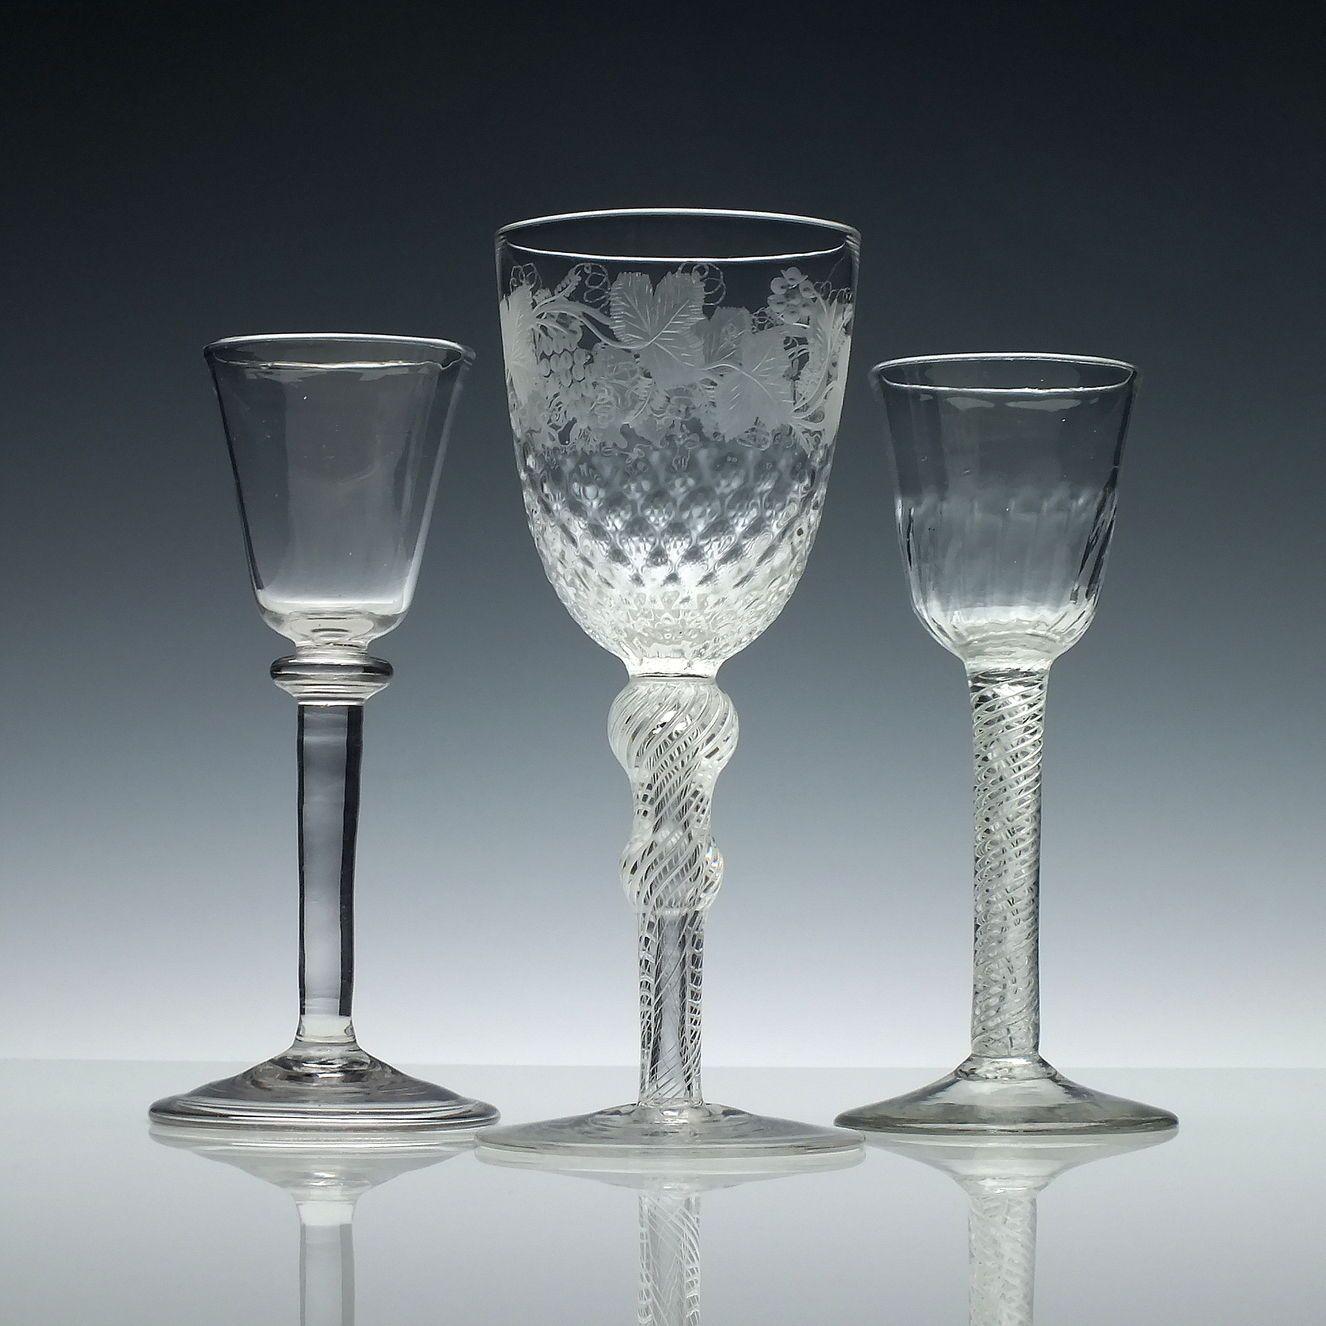 Decorative Arts Provided Set Of Six 19th Century Opaque Twist Wine Glasses C1860